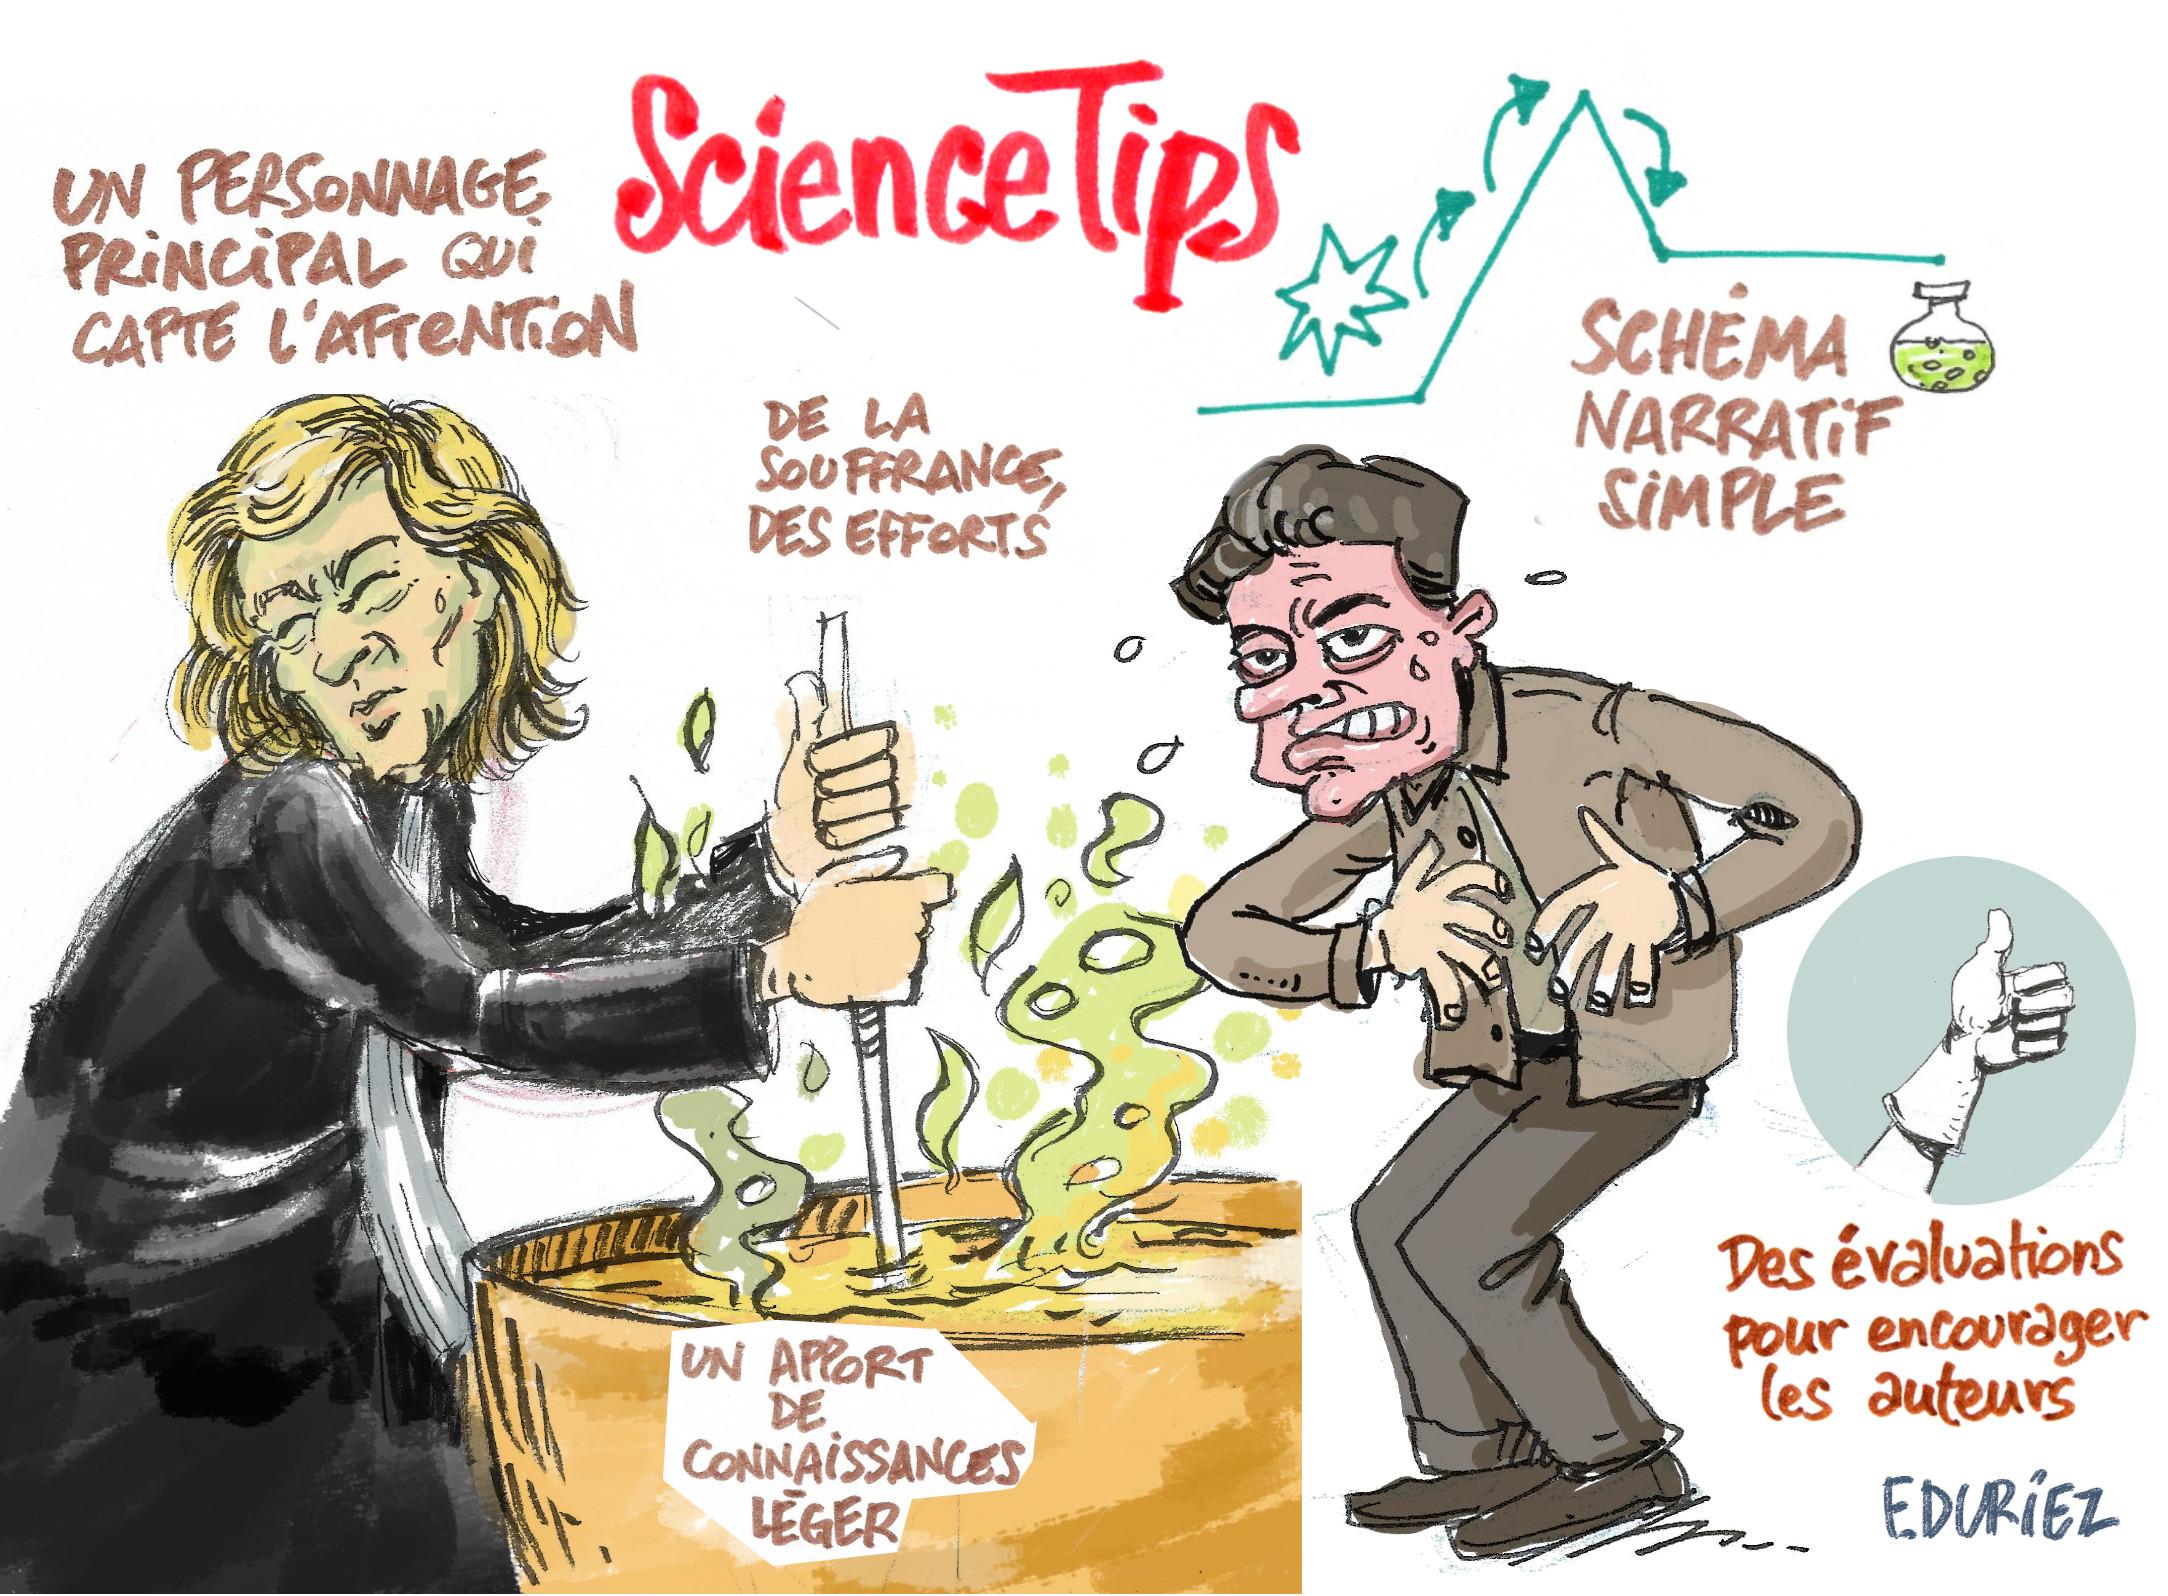 le storytelling de science tips